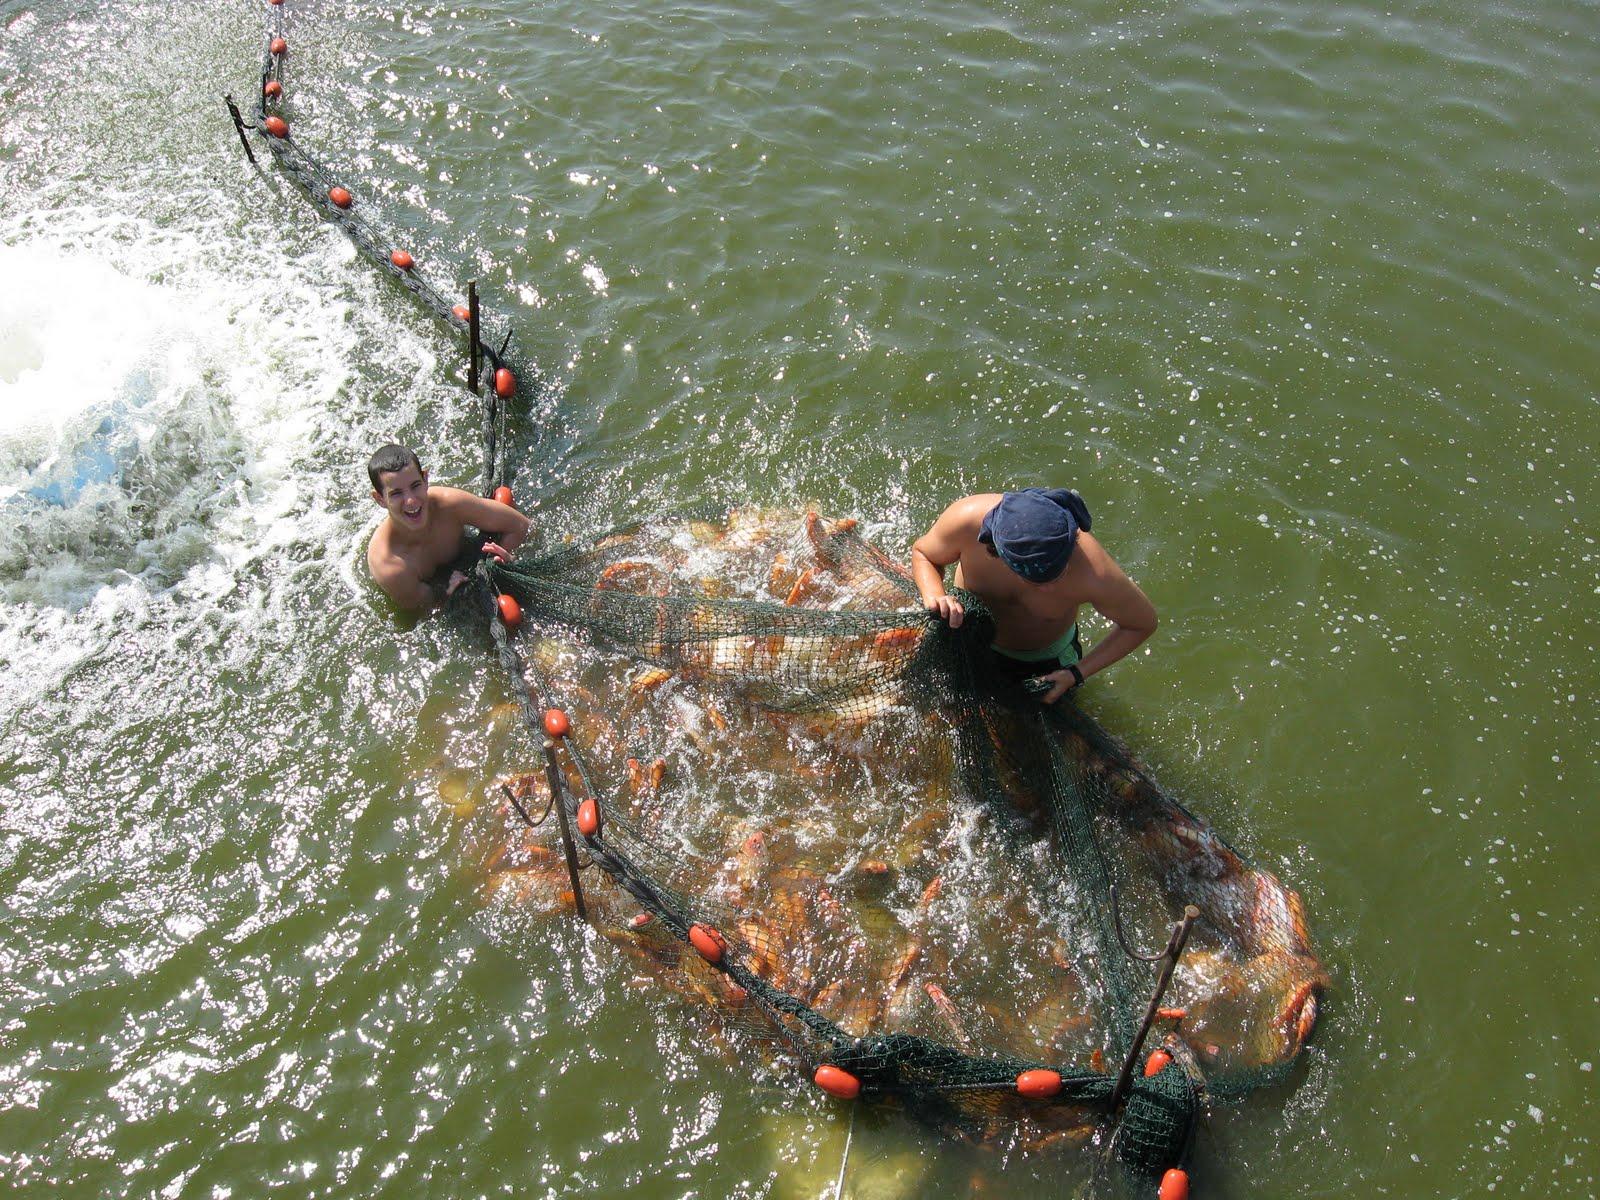 Sustainable fish farming tilapia farming in israel for Tilapia fish farming